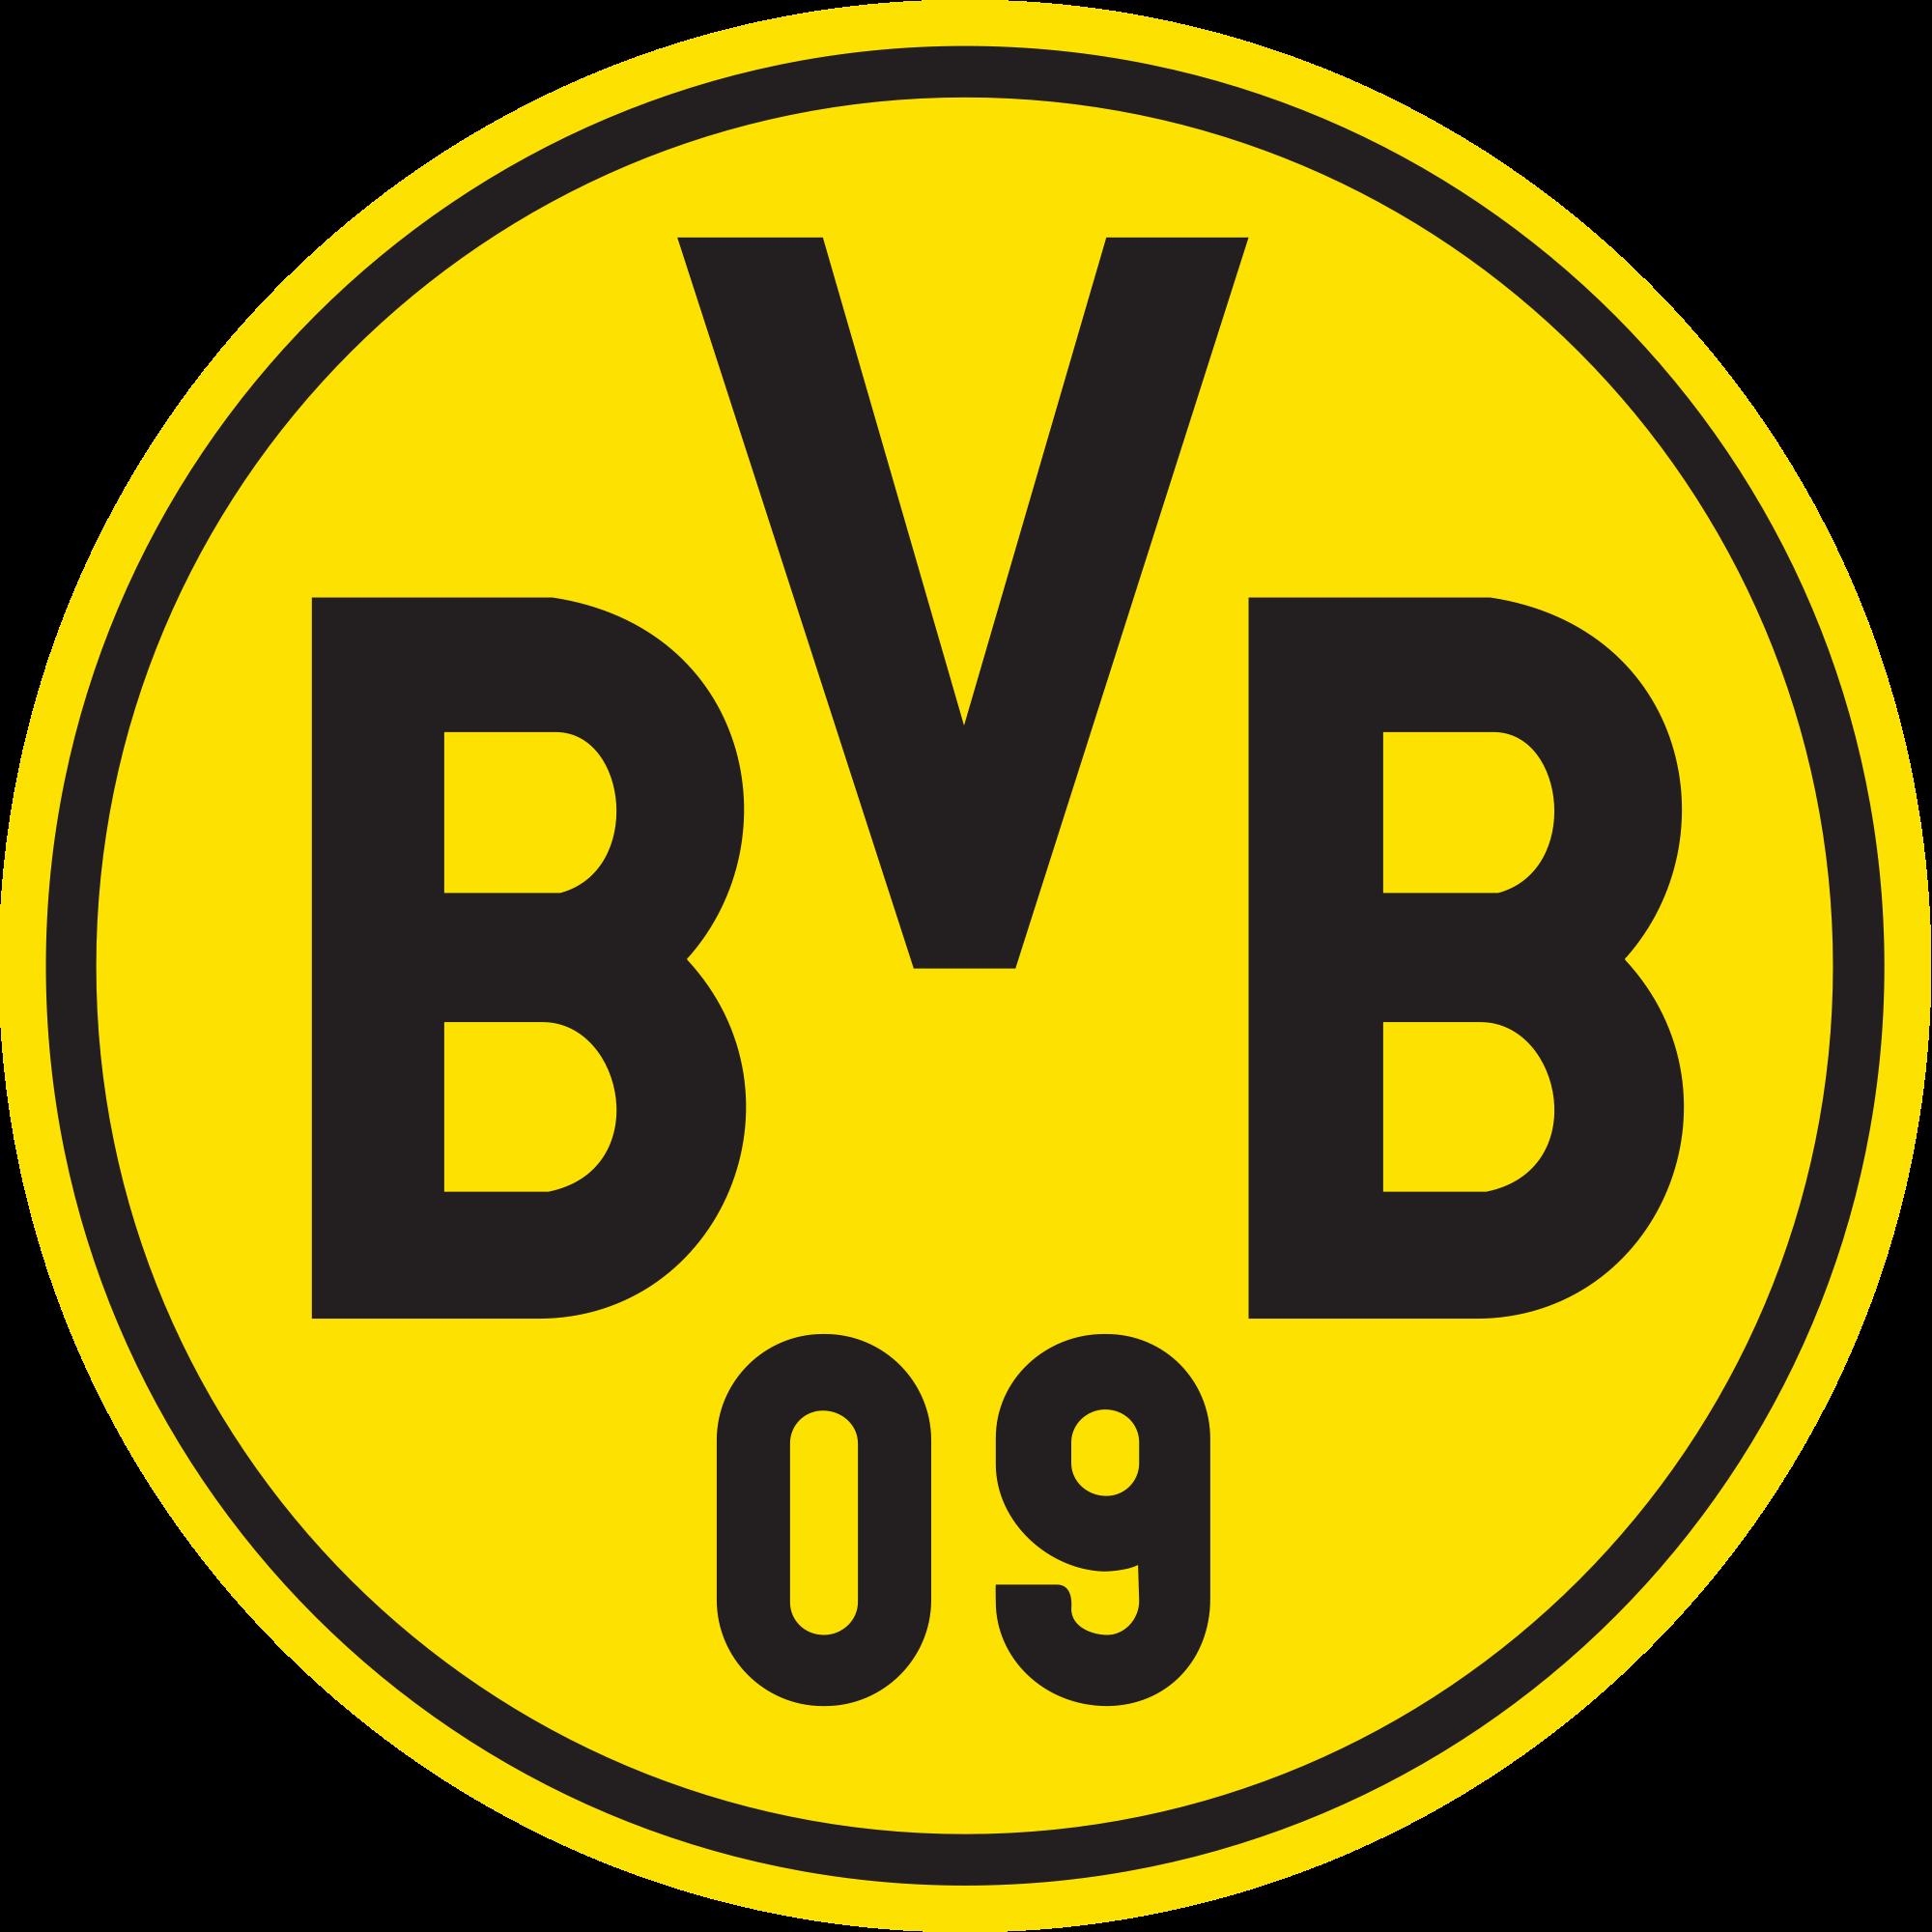 Borussia Dortmund U13 Vs Rb Leipzig U13 0 2